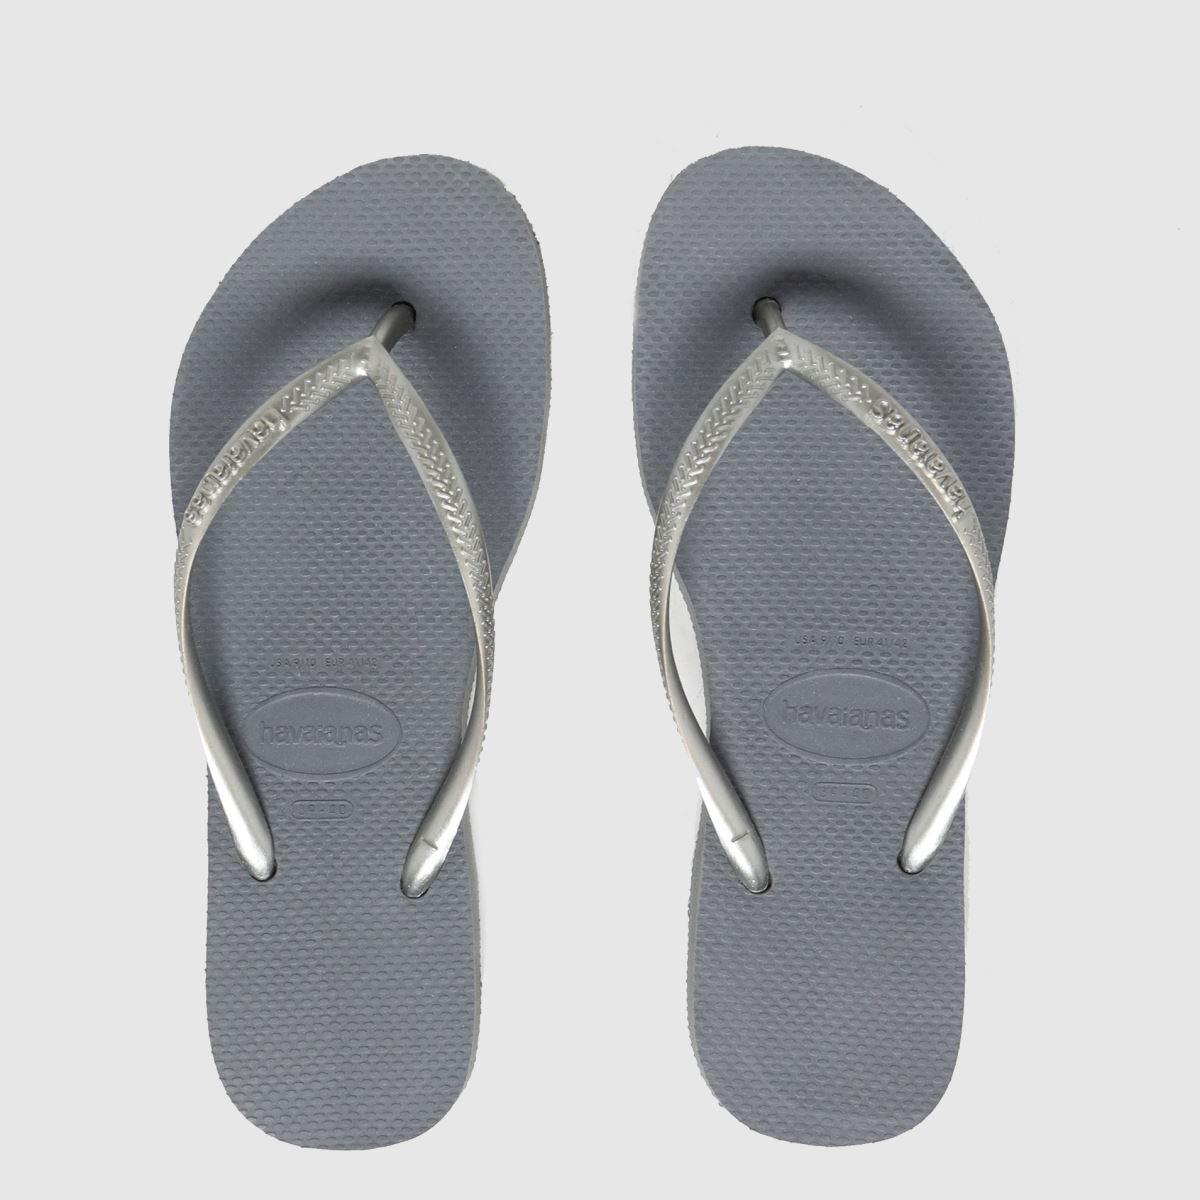 Havaianas Grey Slim Flatform Sandals